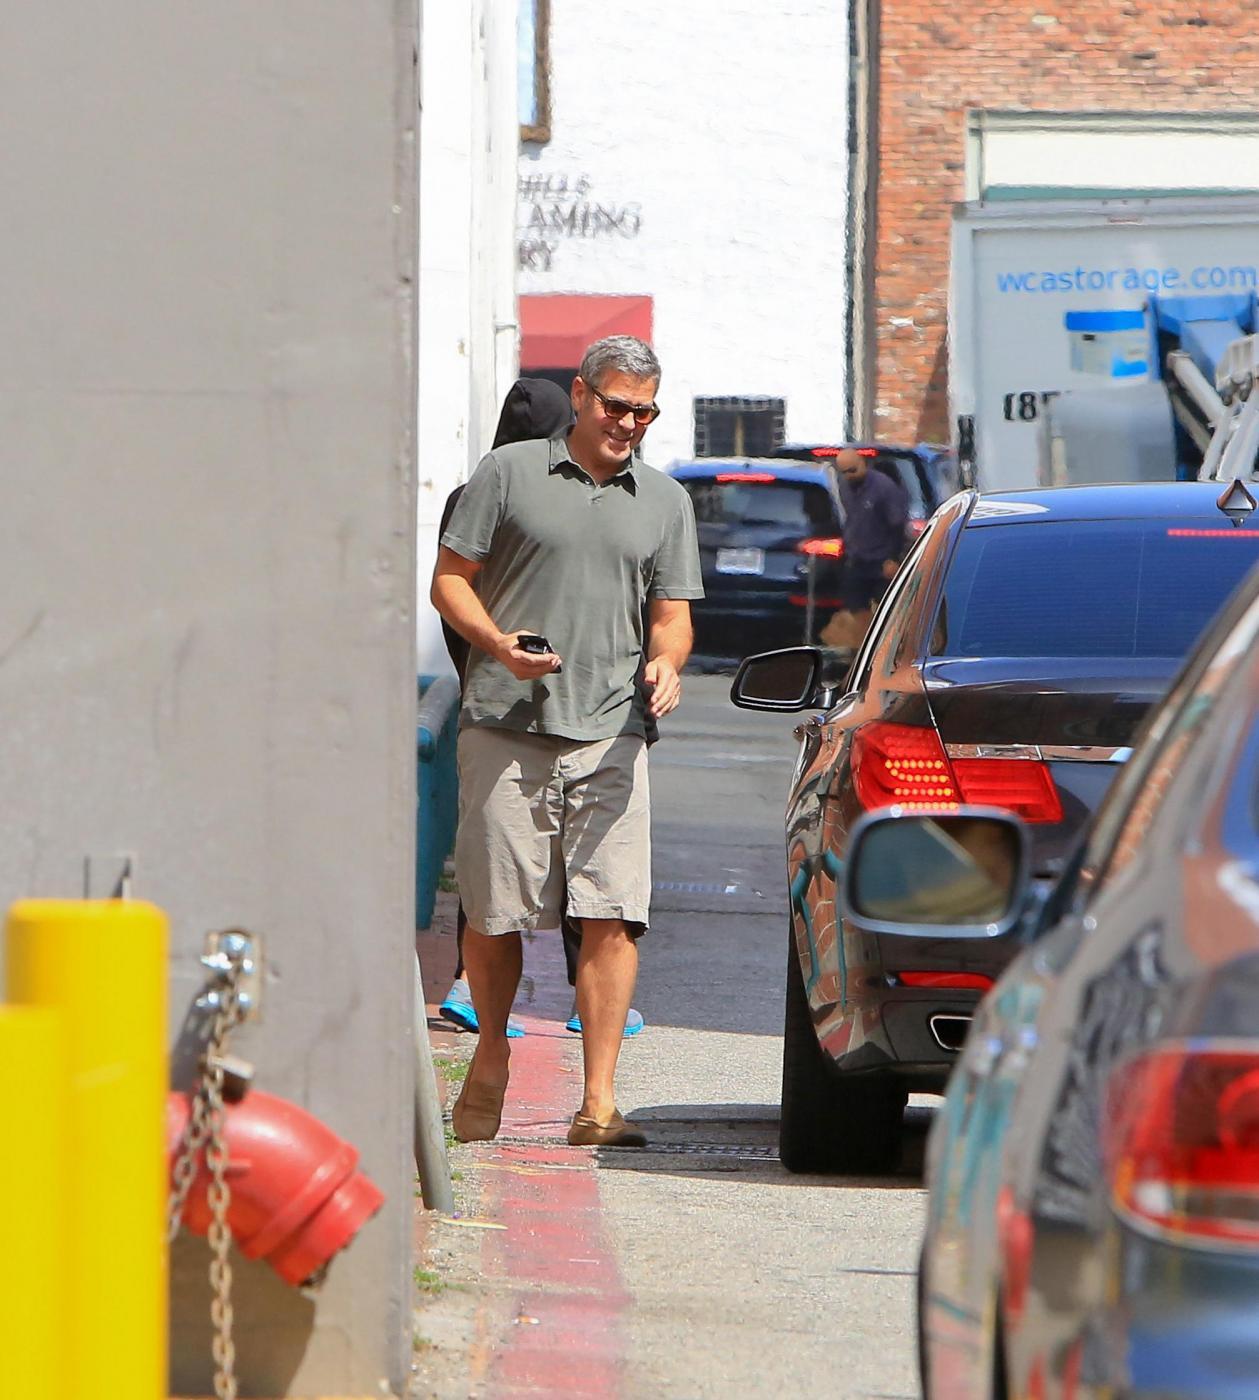 George Clooney, pantaloni corti e mocassini in giro per Beverly Hills FOTO 8